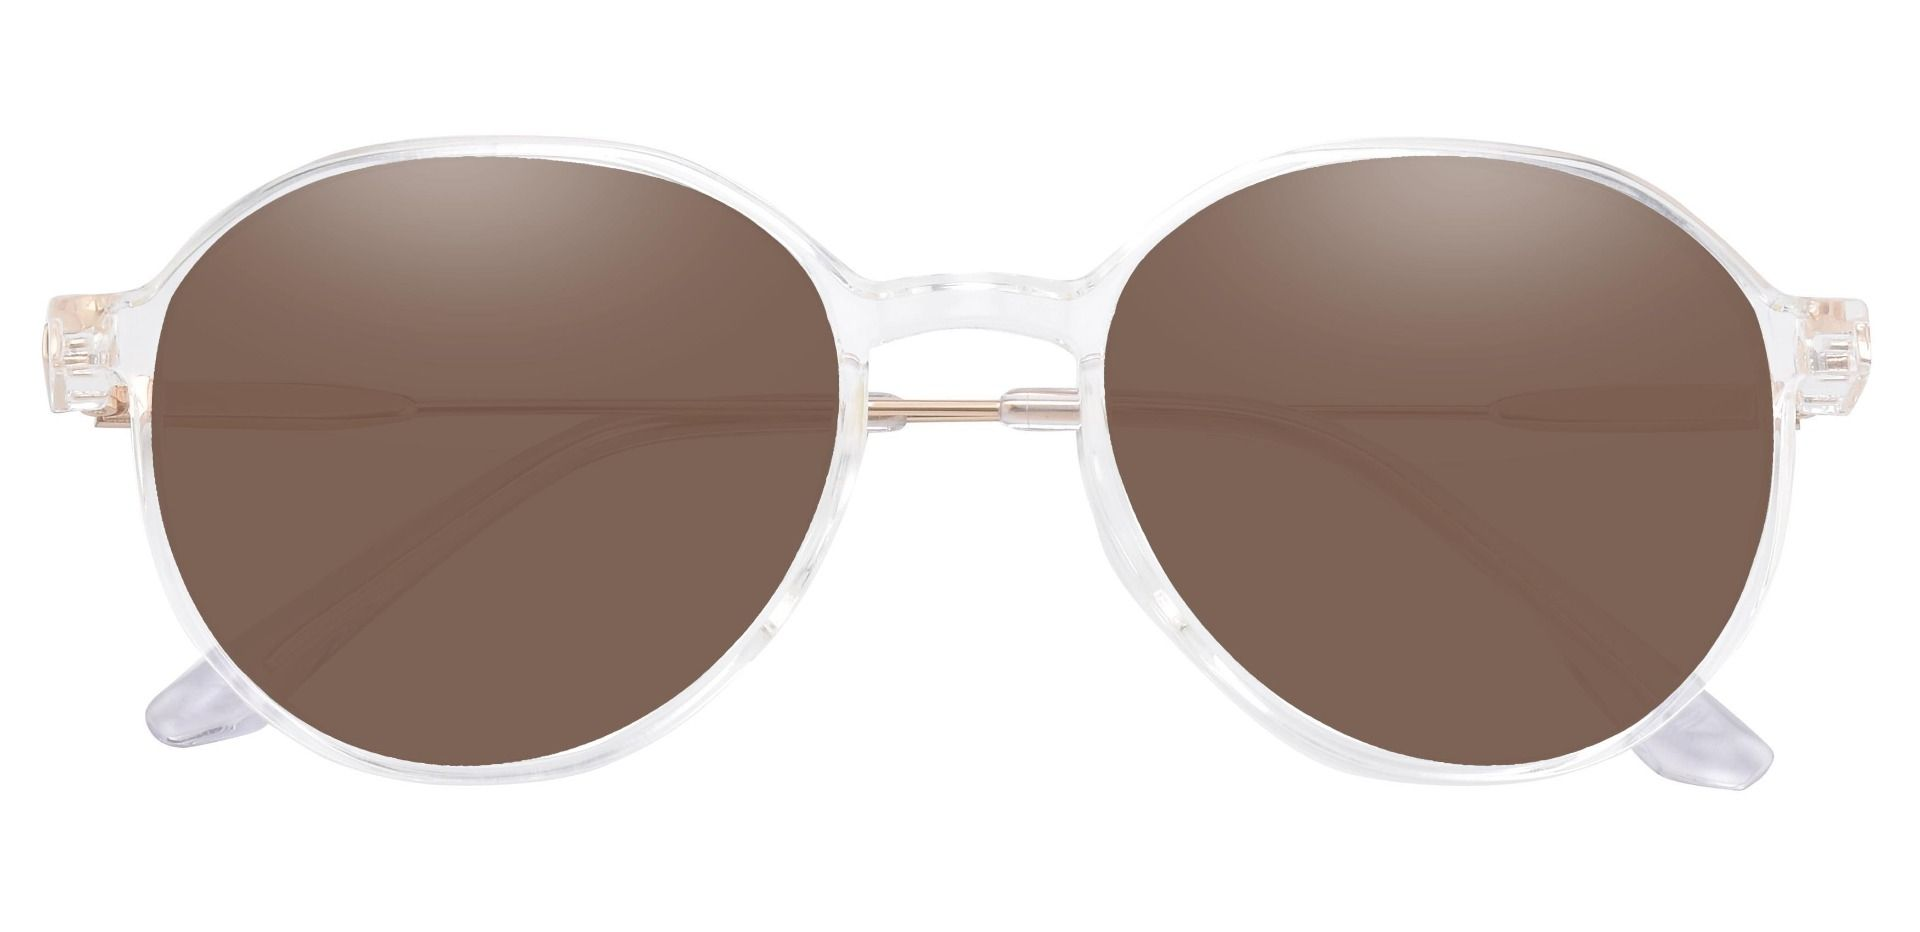 Daytona Geometric Progressive Sunglasses - Clear Frame With Brown Lenses